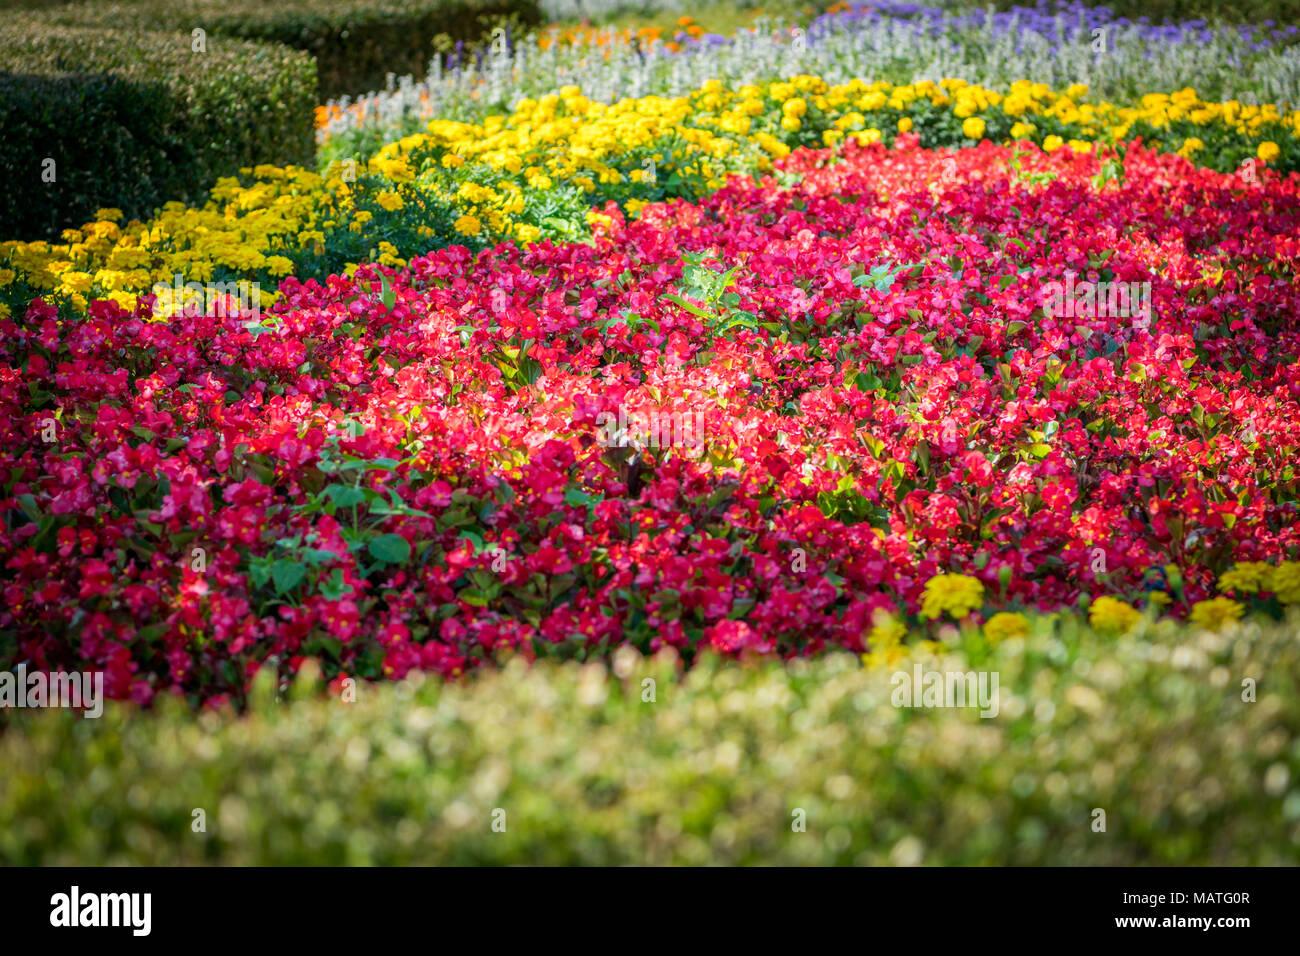 Colorful Flower Bushes In Grassalkovich Garden Stock Photo